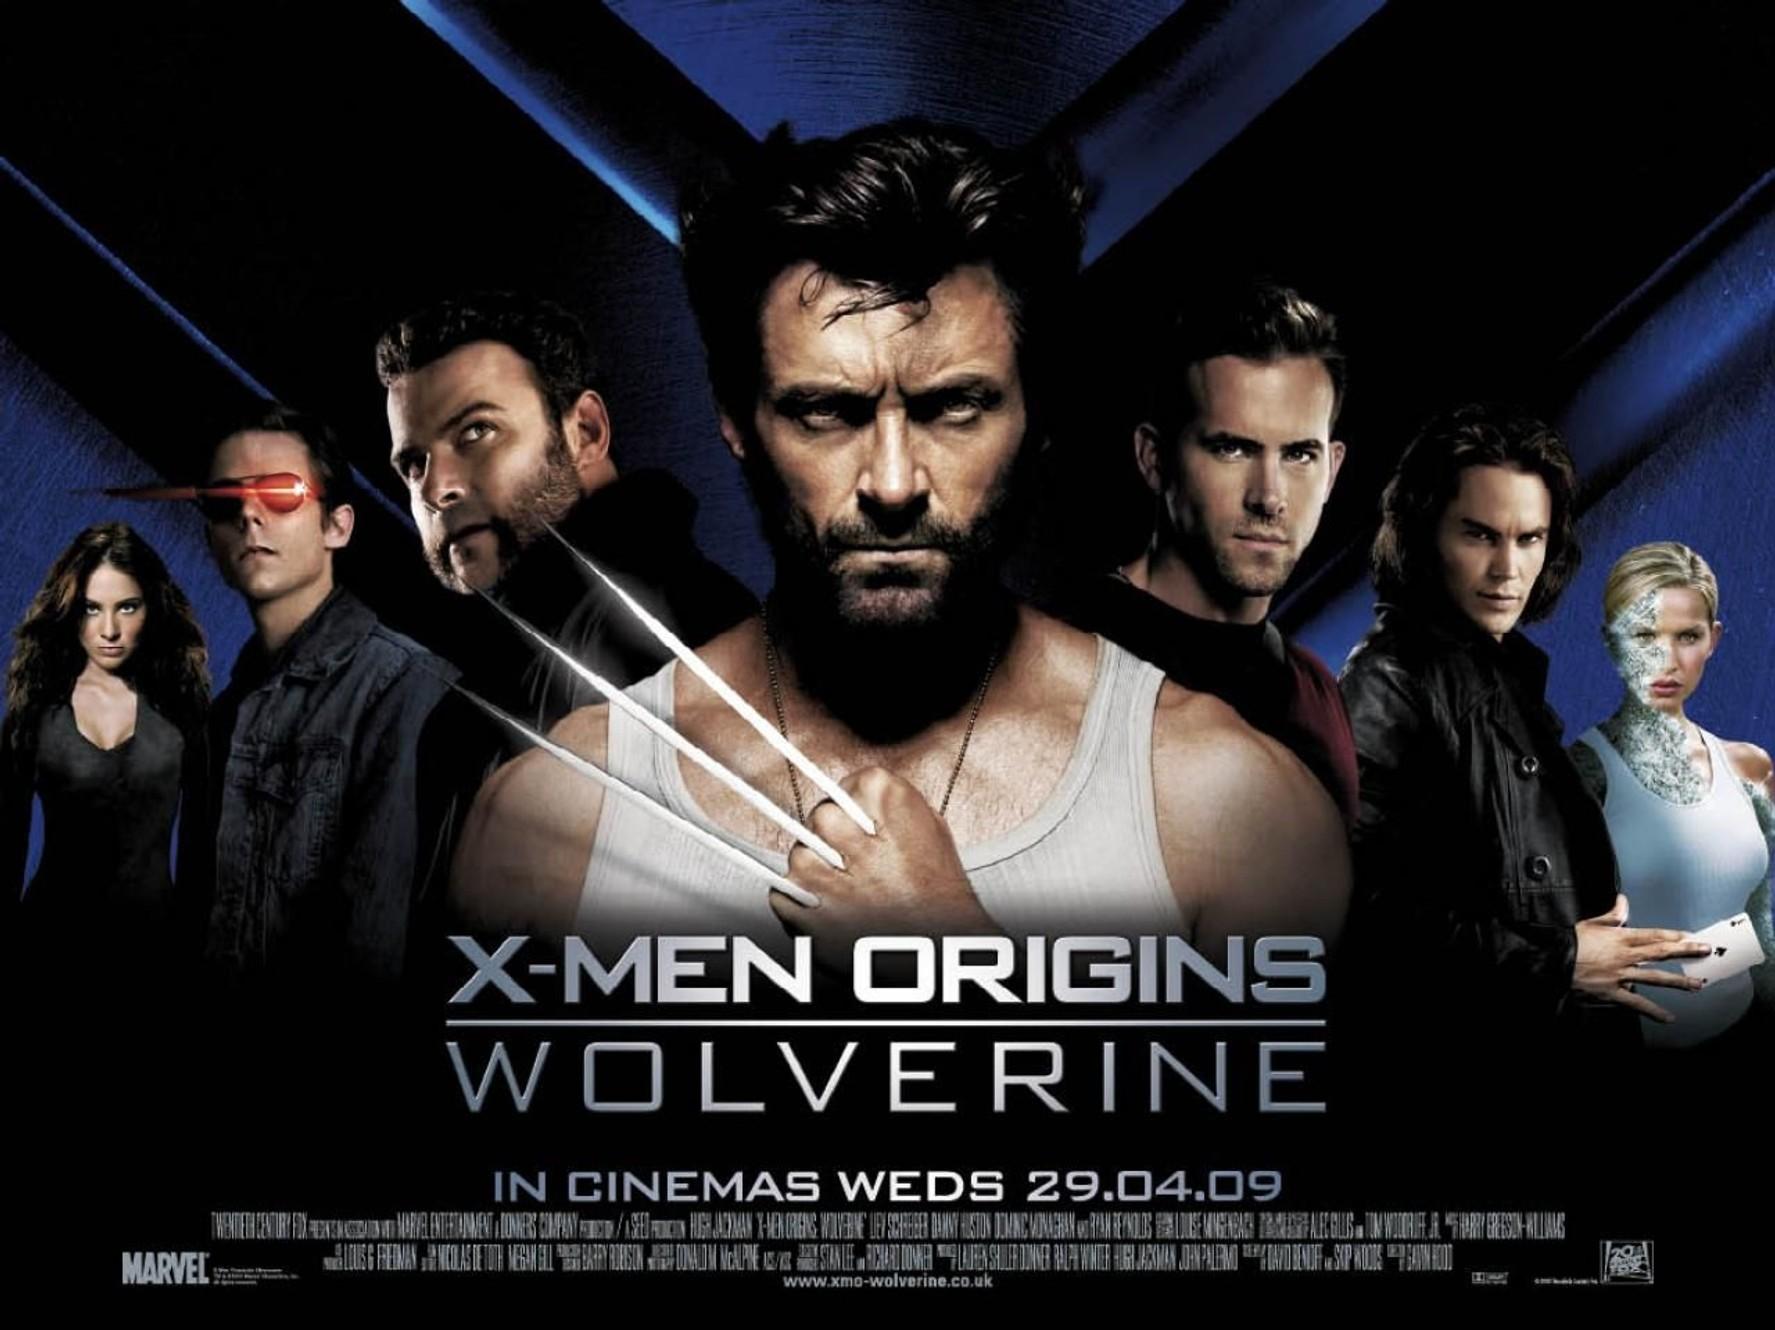 X-Men Origins: Wolverine Poster Does Not Make Sense